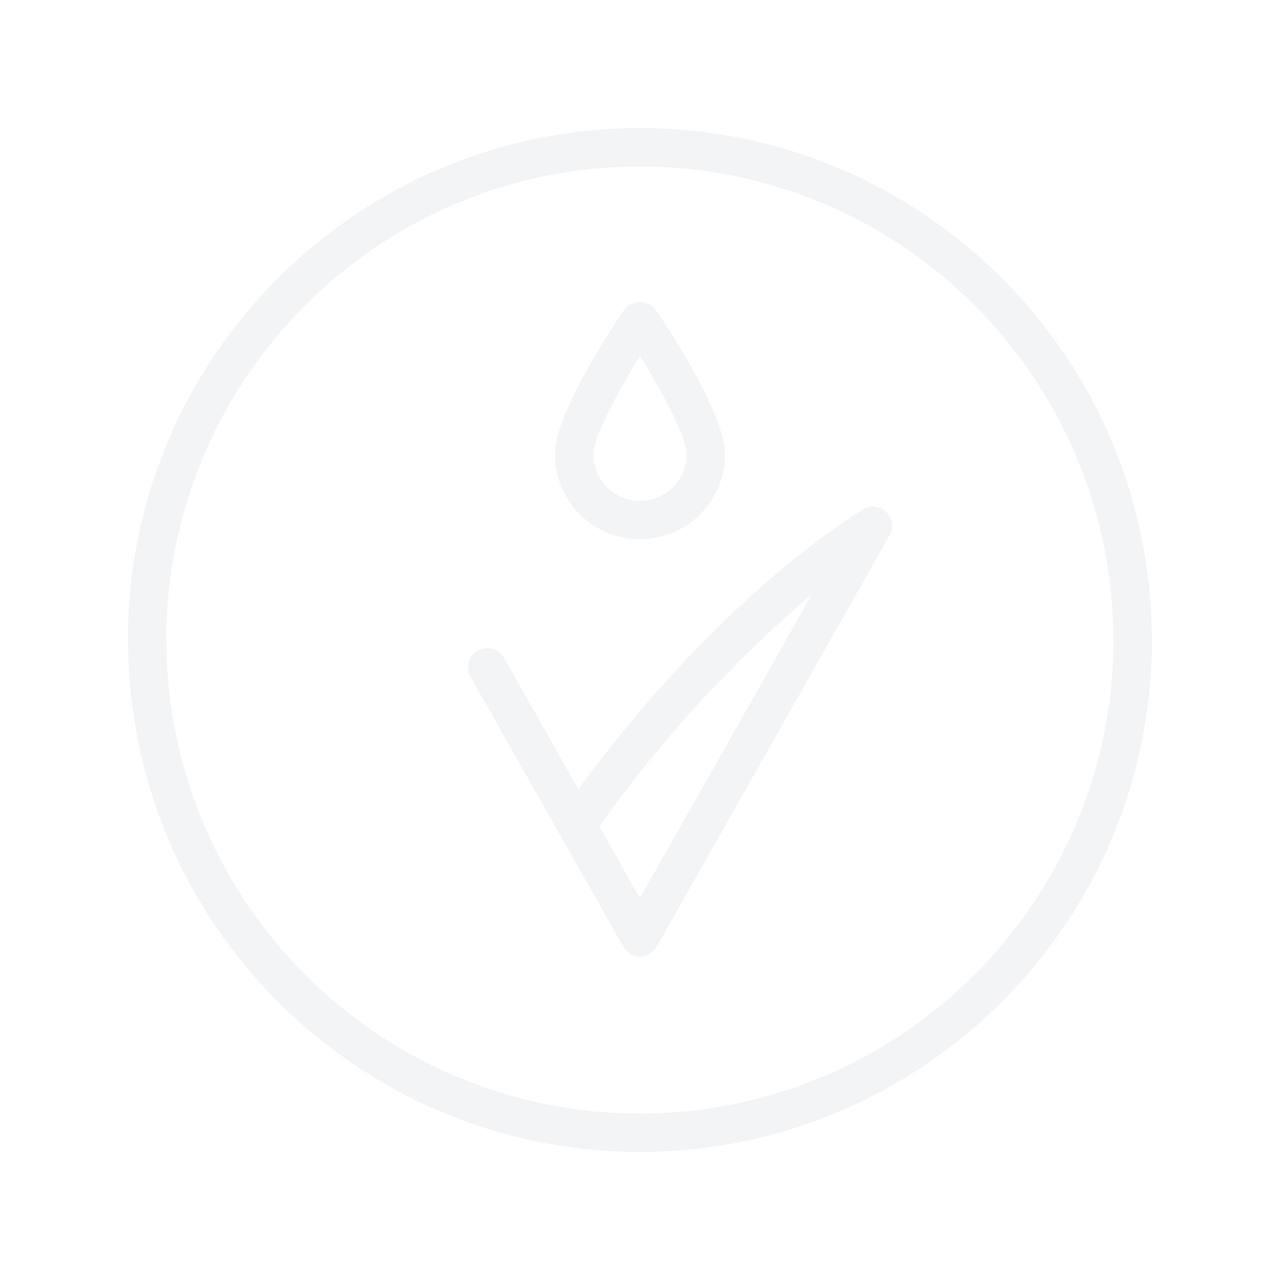 MAKEUP REVOLUTION Obsession Blush 2g